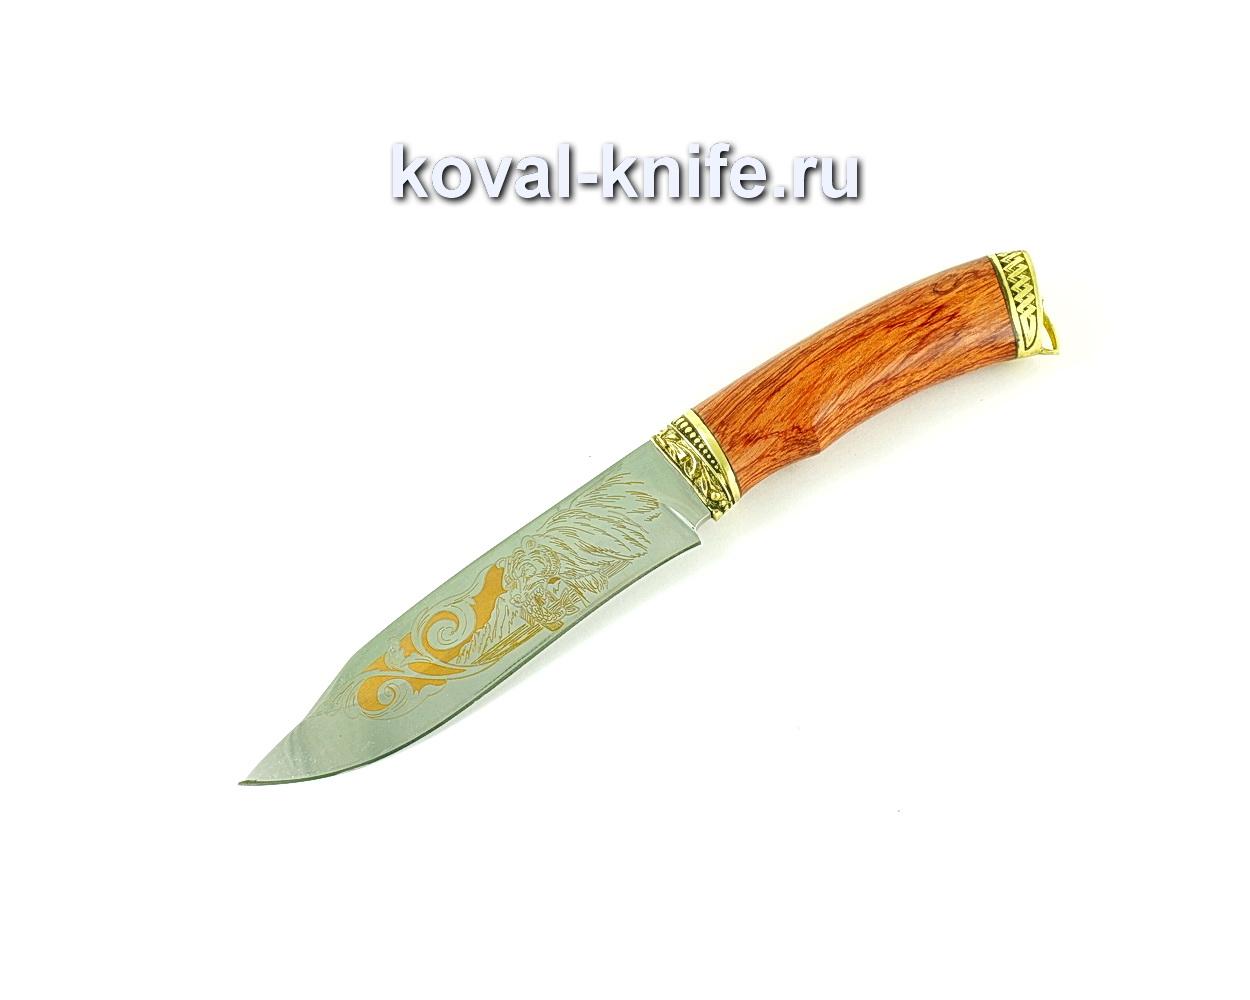 Нож Орлан (сталь 65х13), рукоять бубинга, литье A175